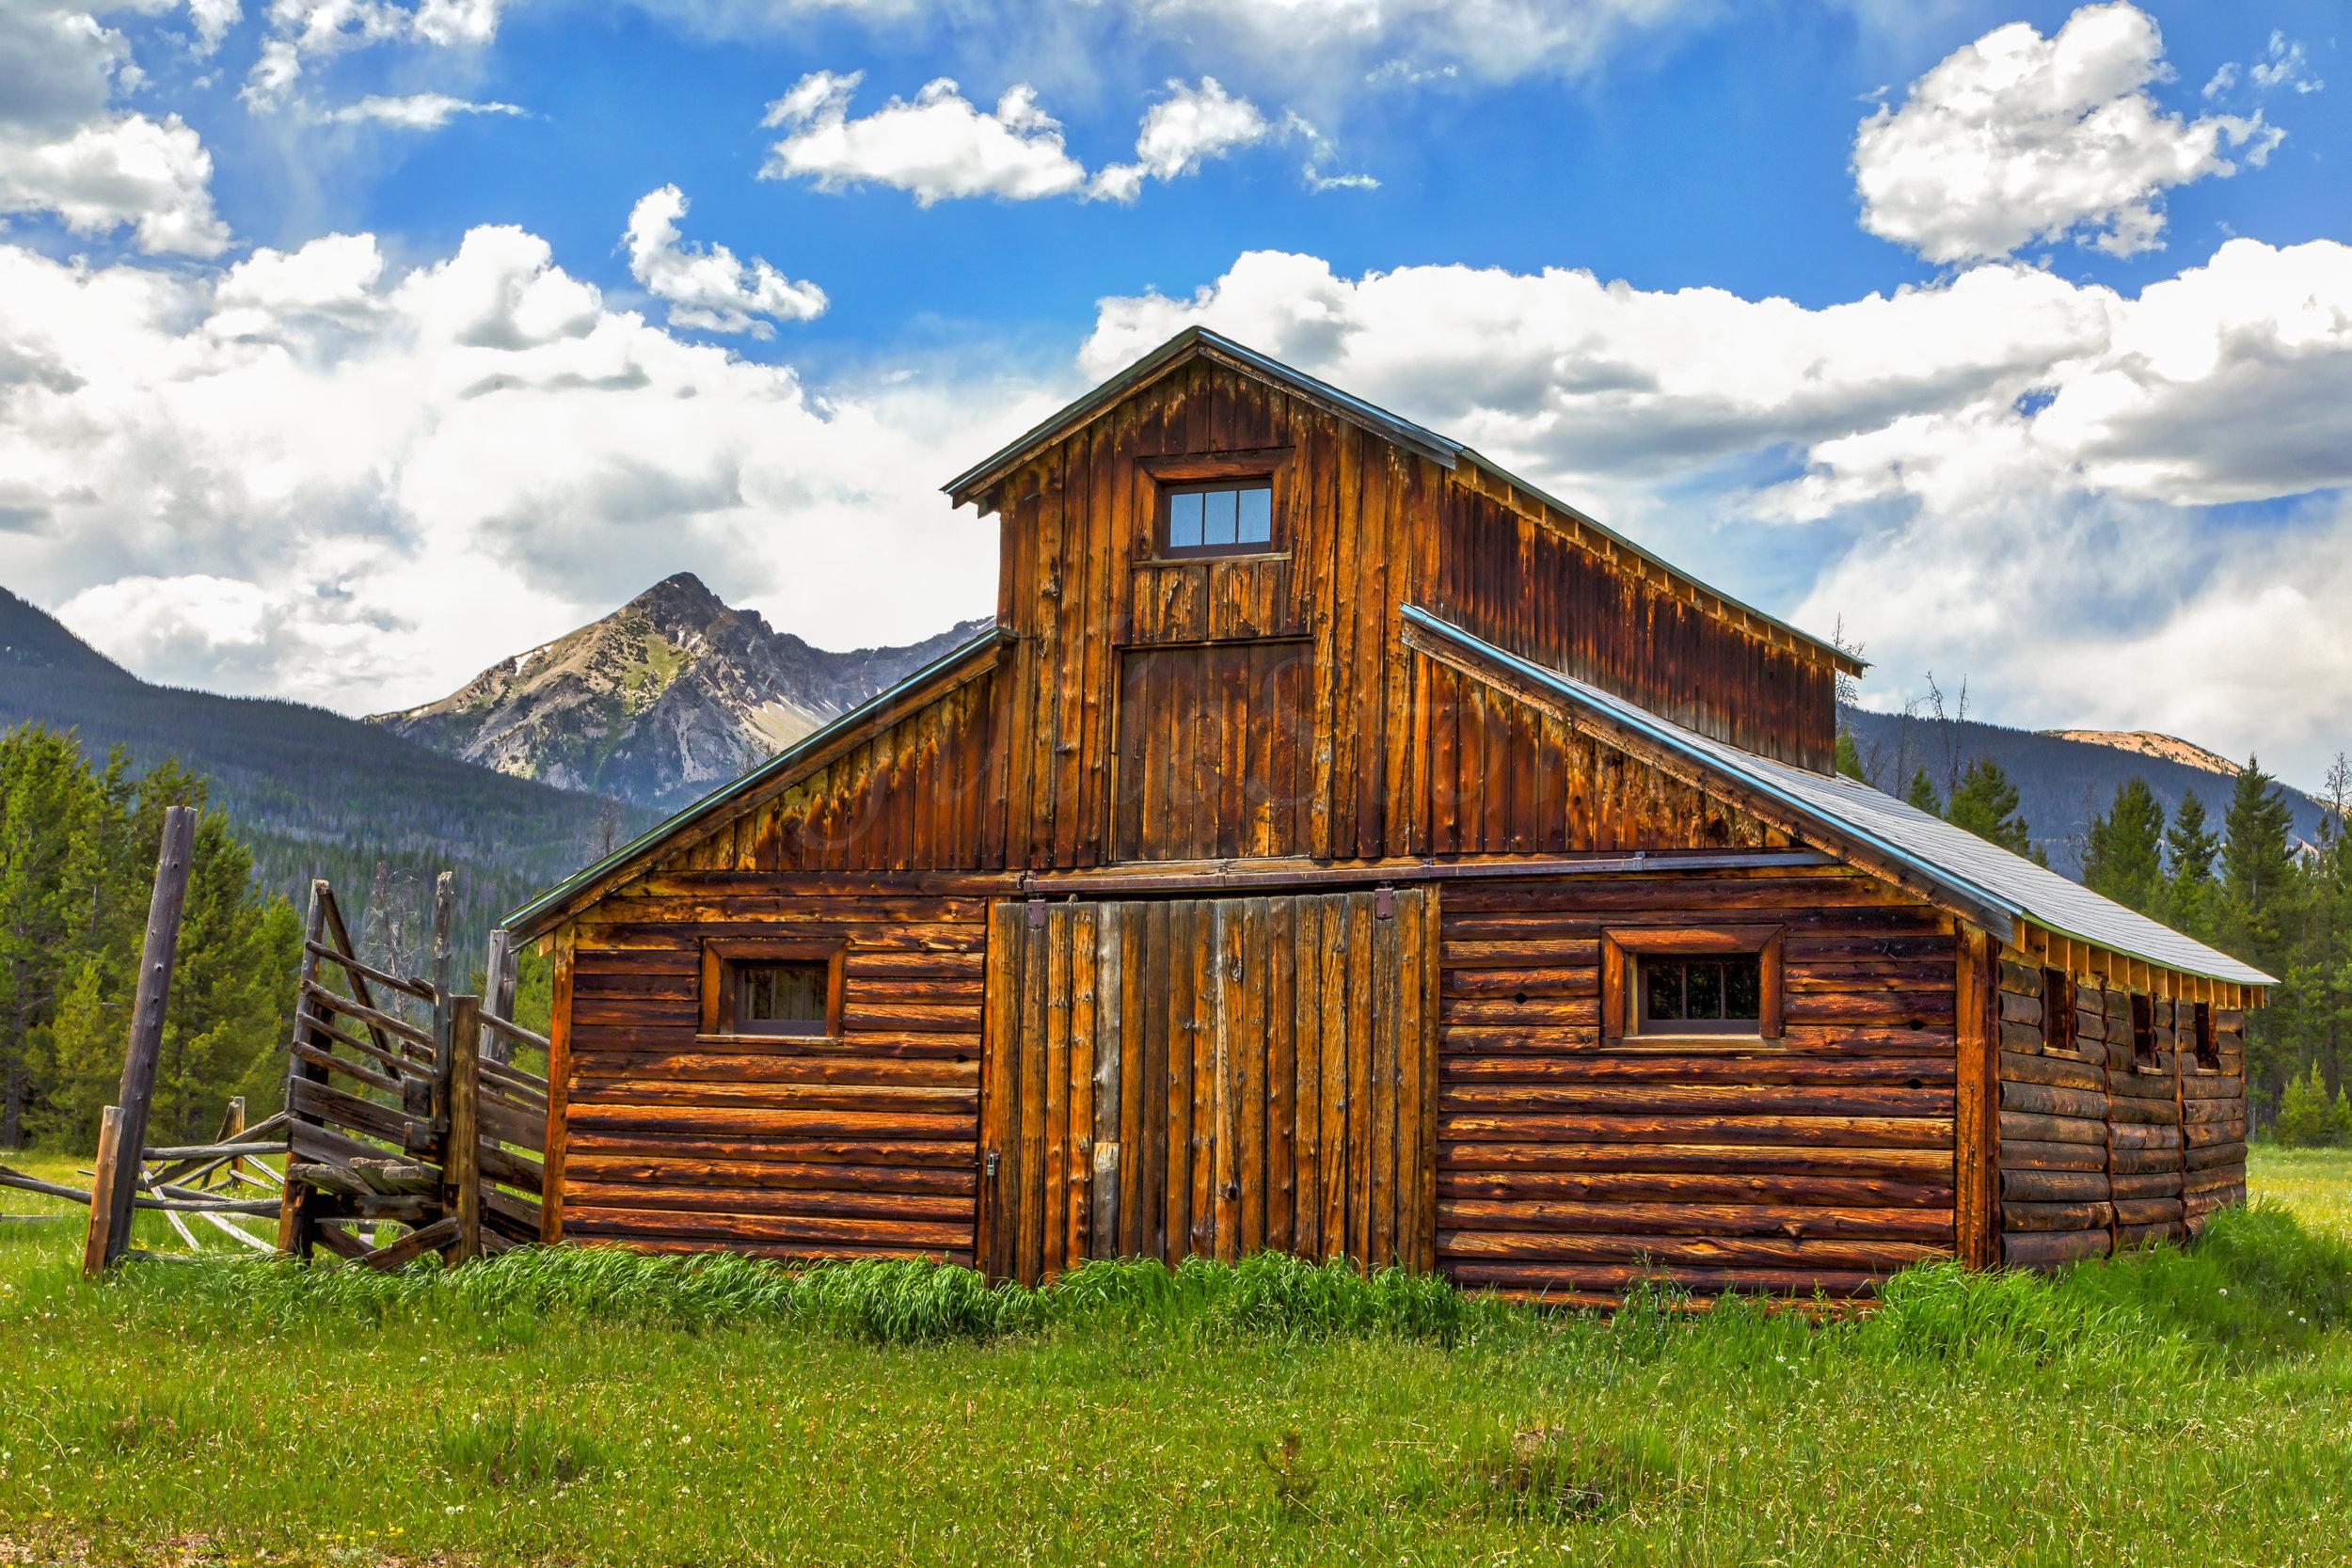 Little Buckaroo Barn, Image # 0915